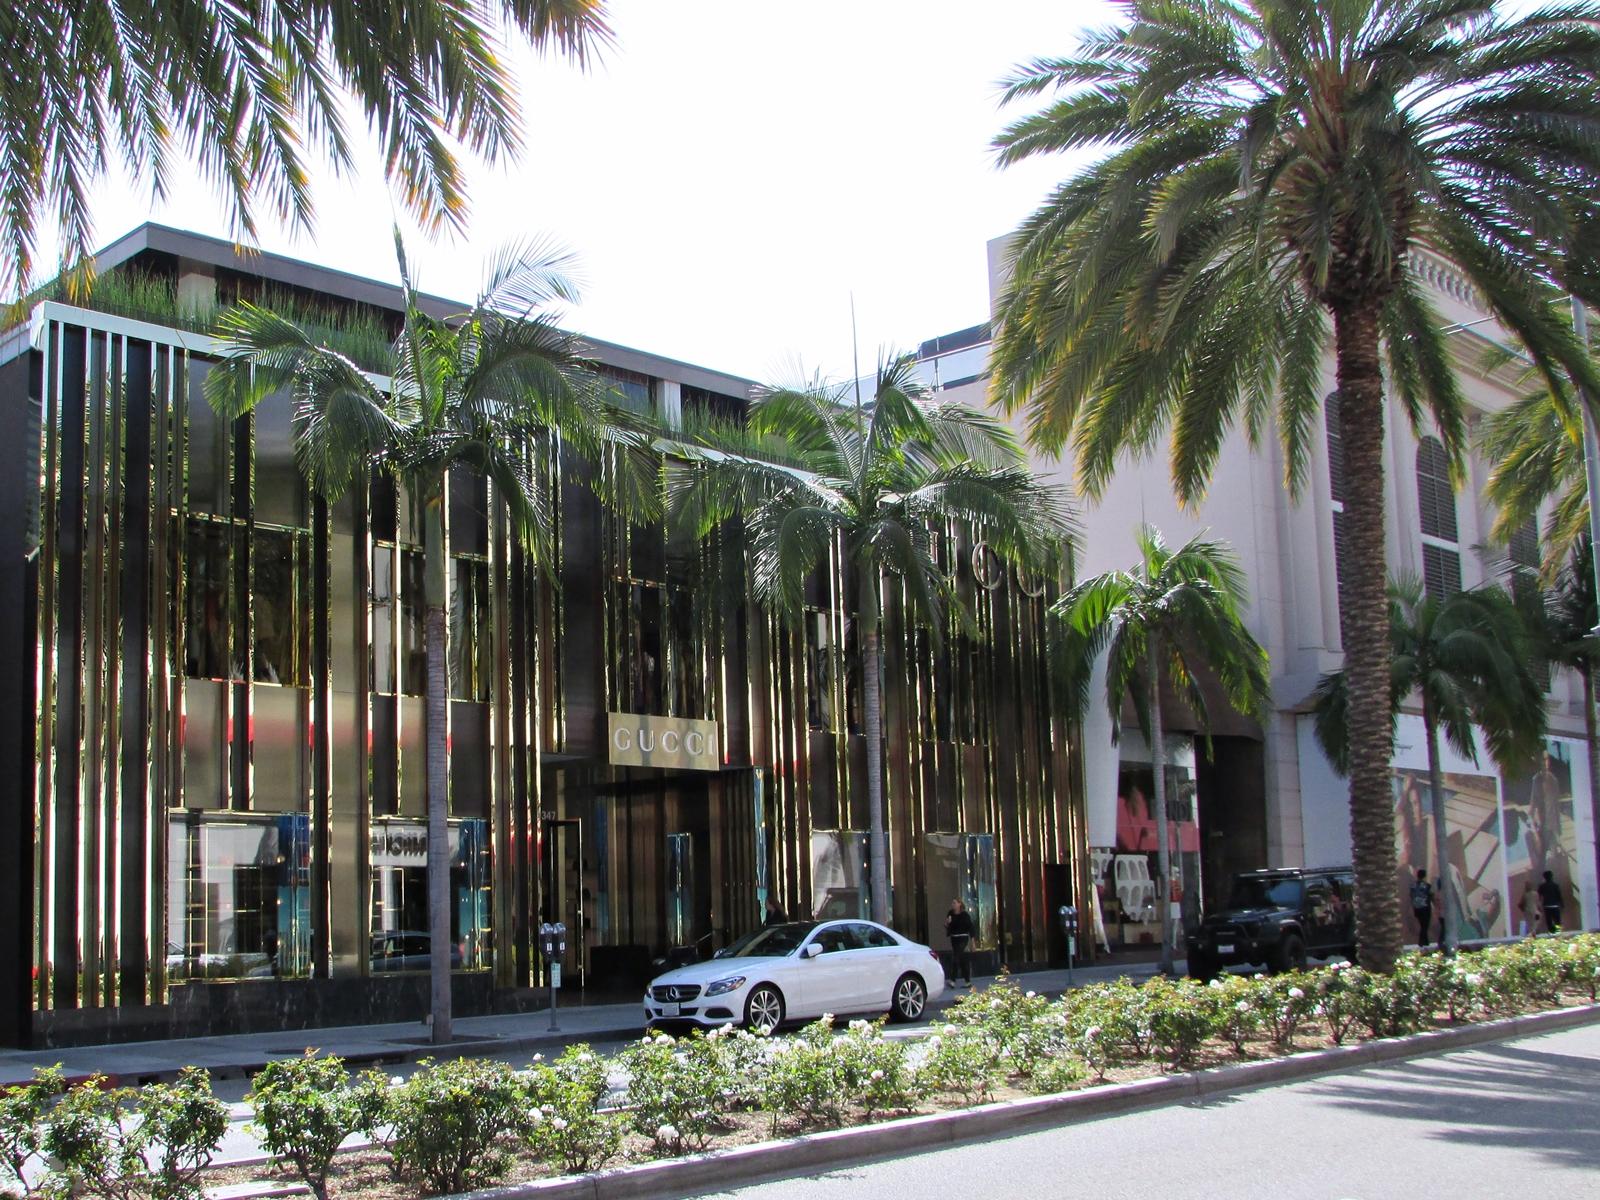 Rodeo Drive - Beverly Hills - USA Rundreise - Amerika Roadtrip - Fashionladyloves by Tamara Wagner - Trvelblog